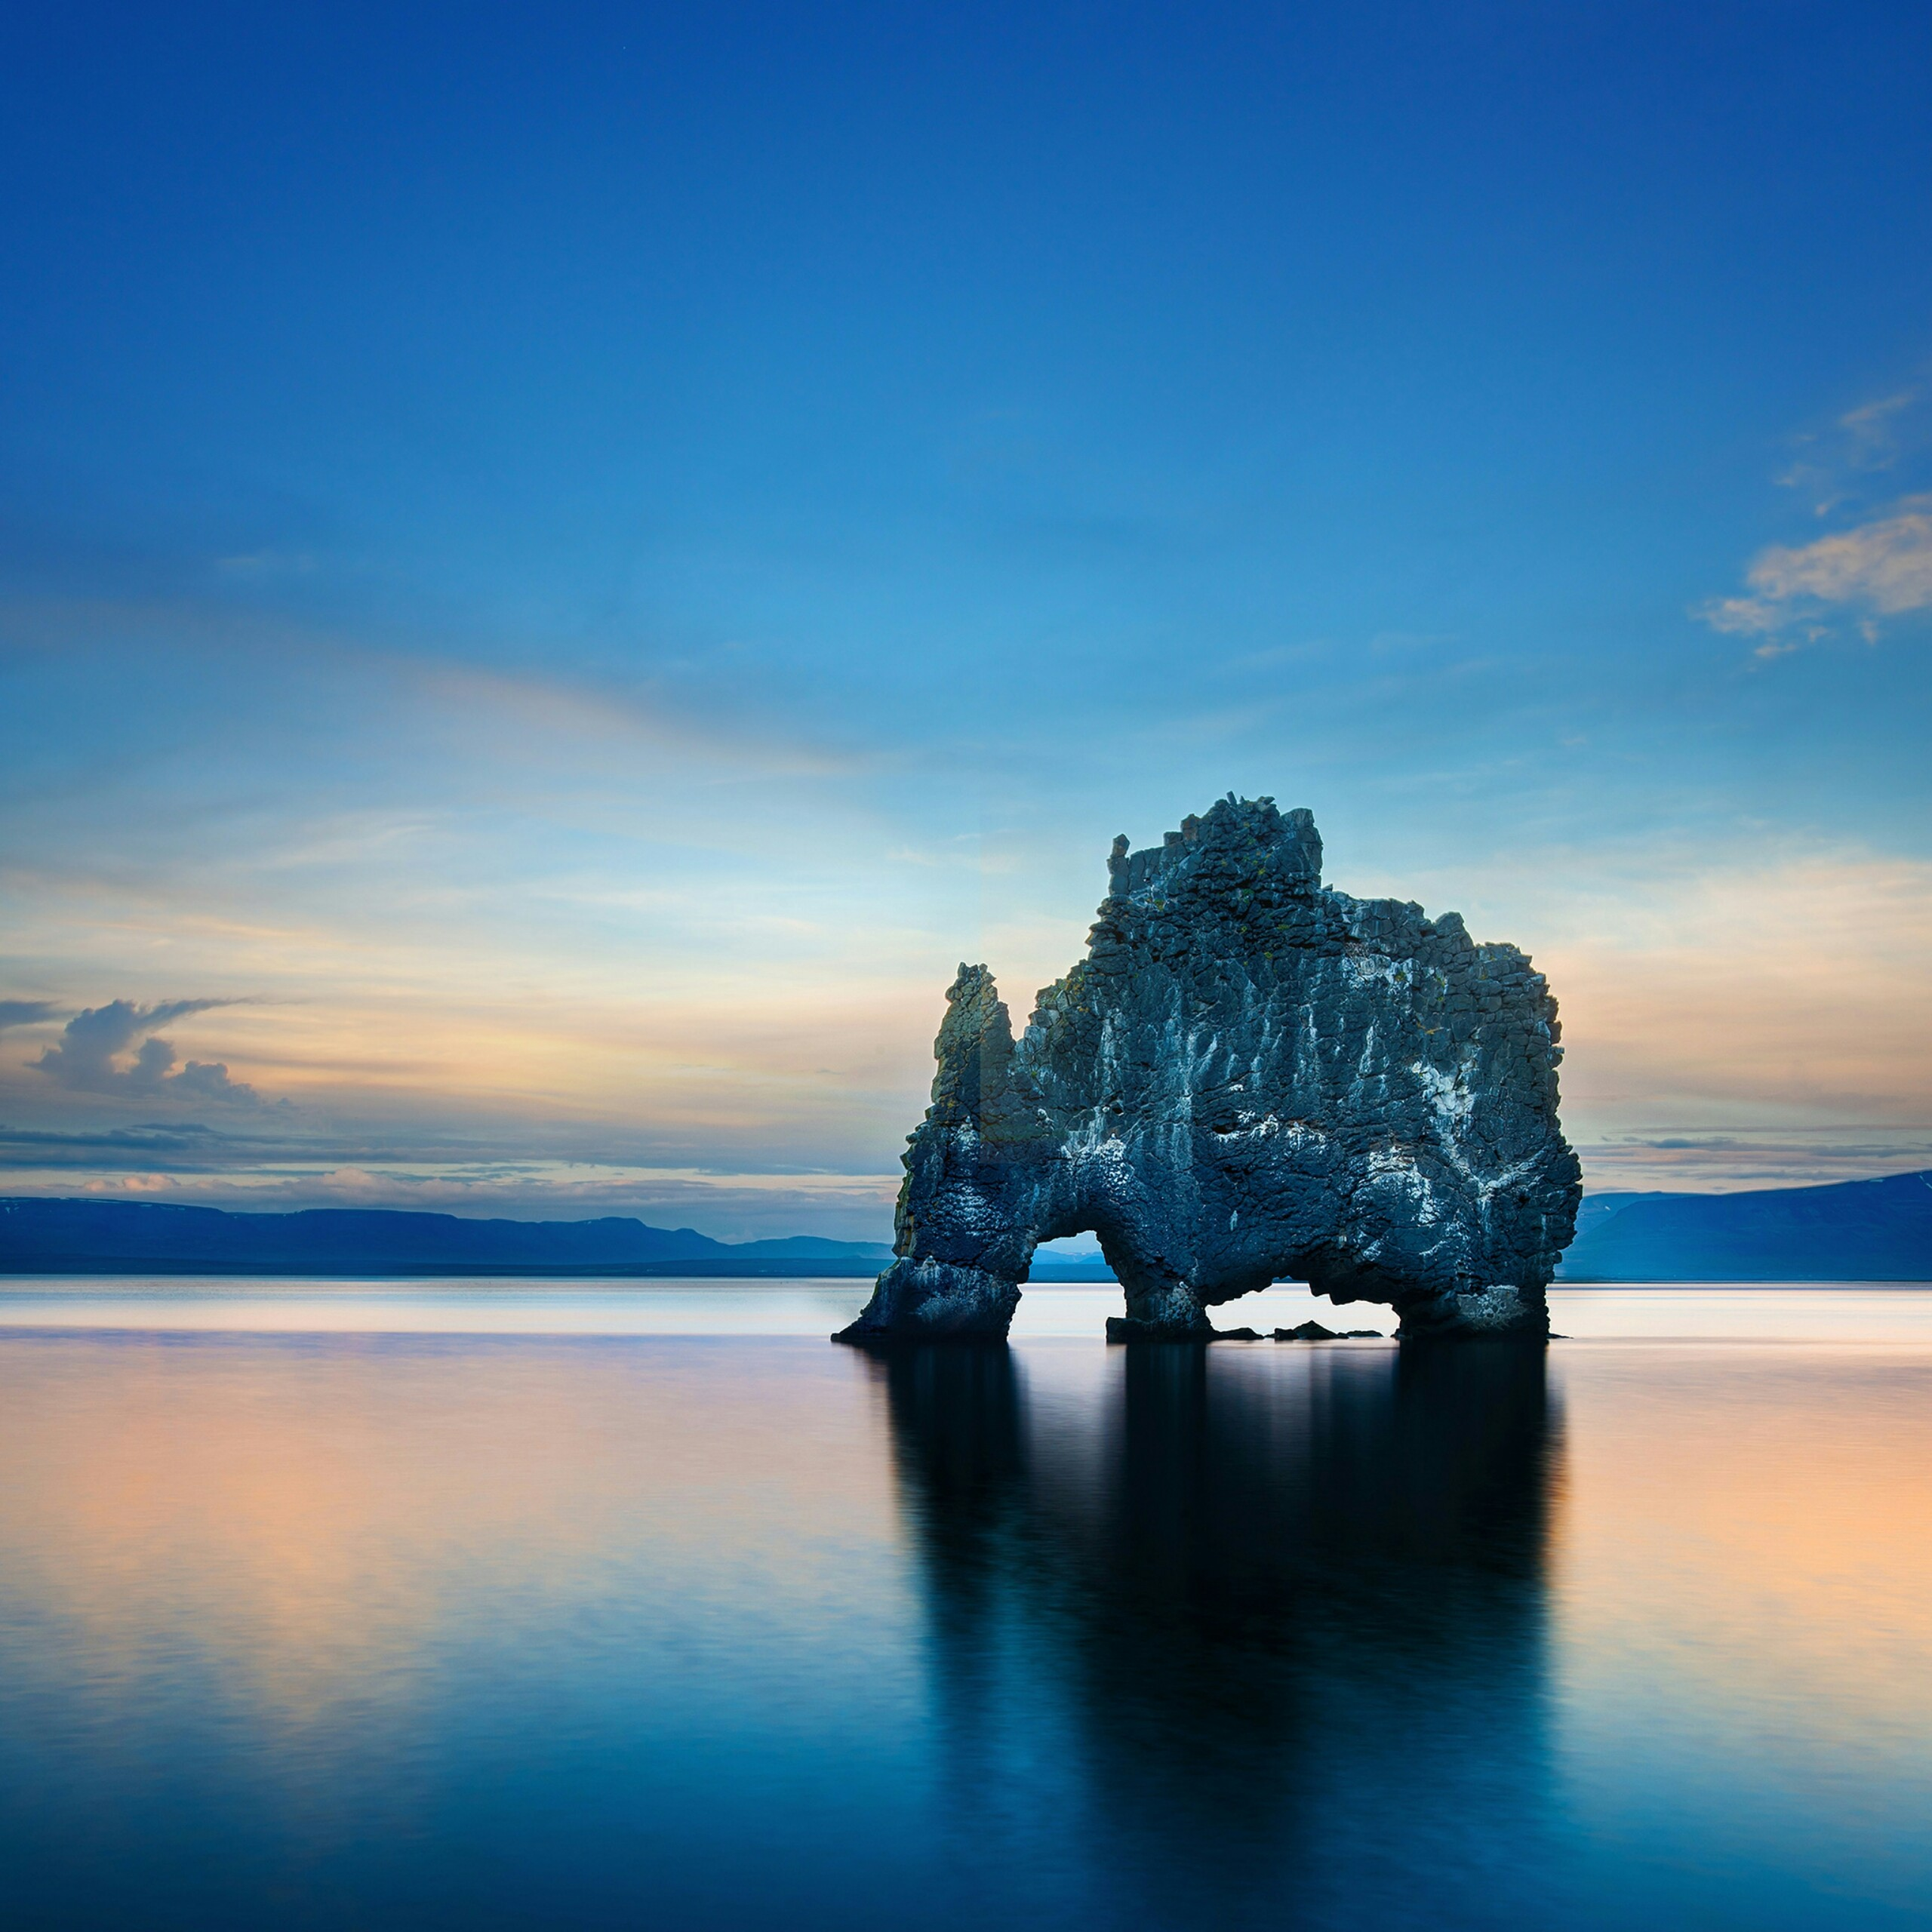 A Rock In The Shape Of An Animal Nature Qhd Wallpaper Hvitserkur